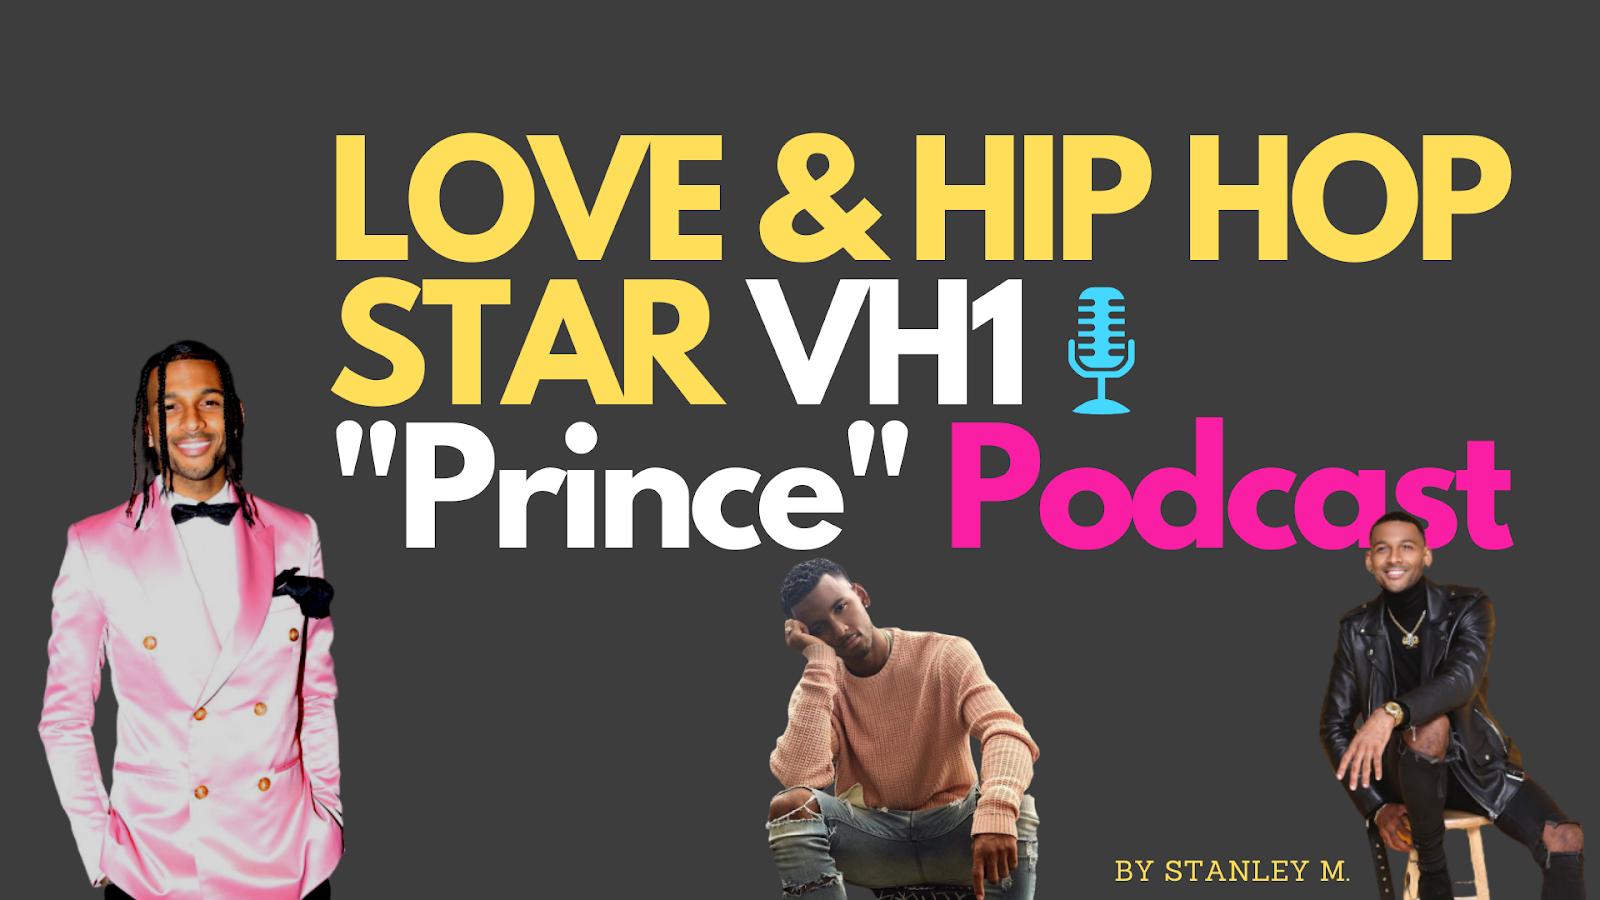 onlyfans, prince, papii rose, princehasspoken, instagram, love and hip hop, rapper, singer, music video